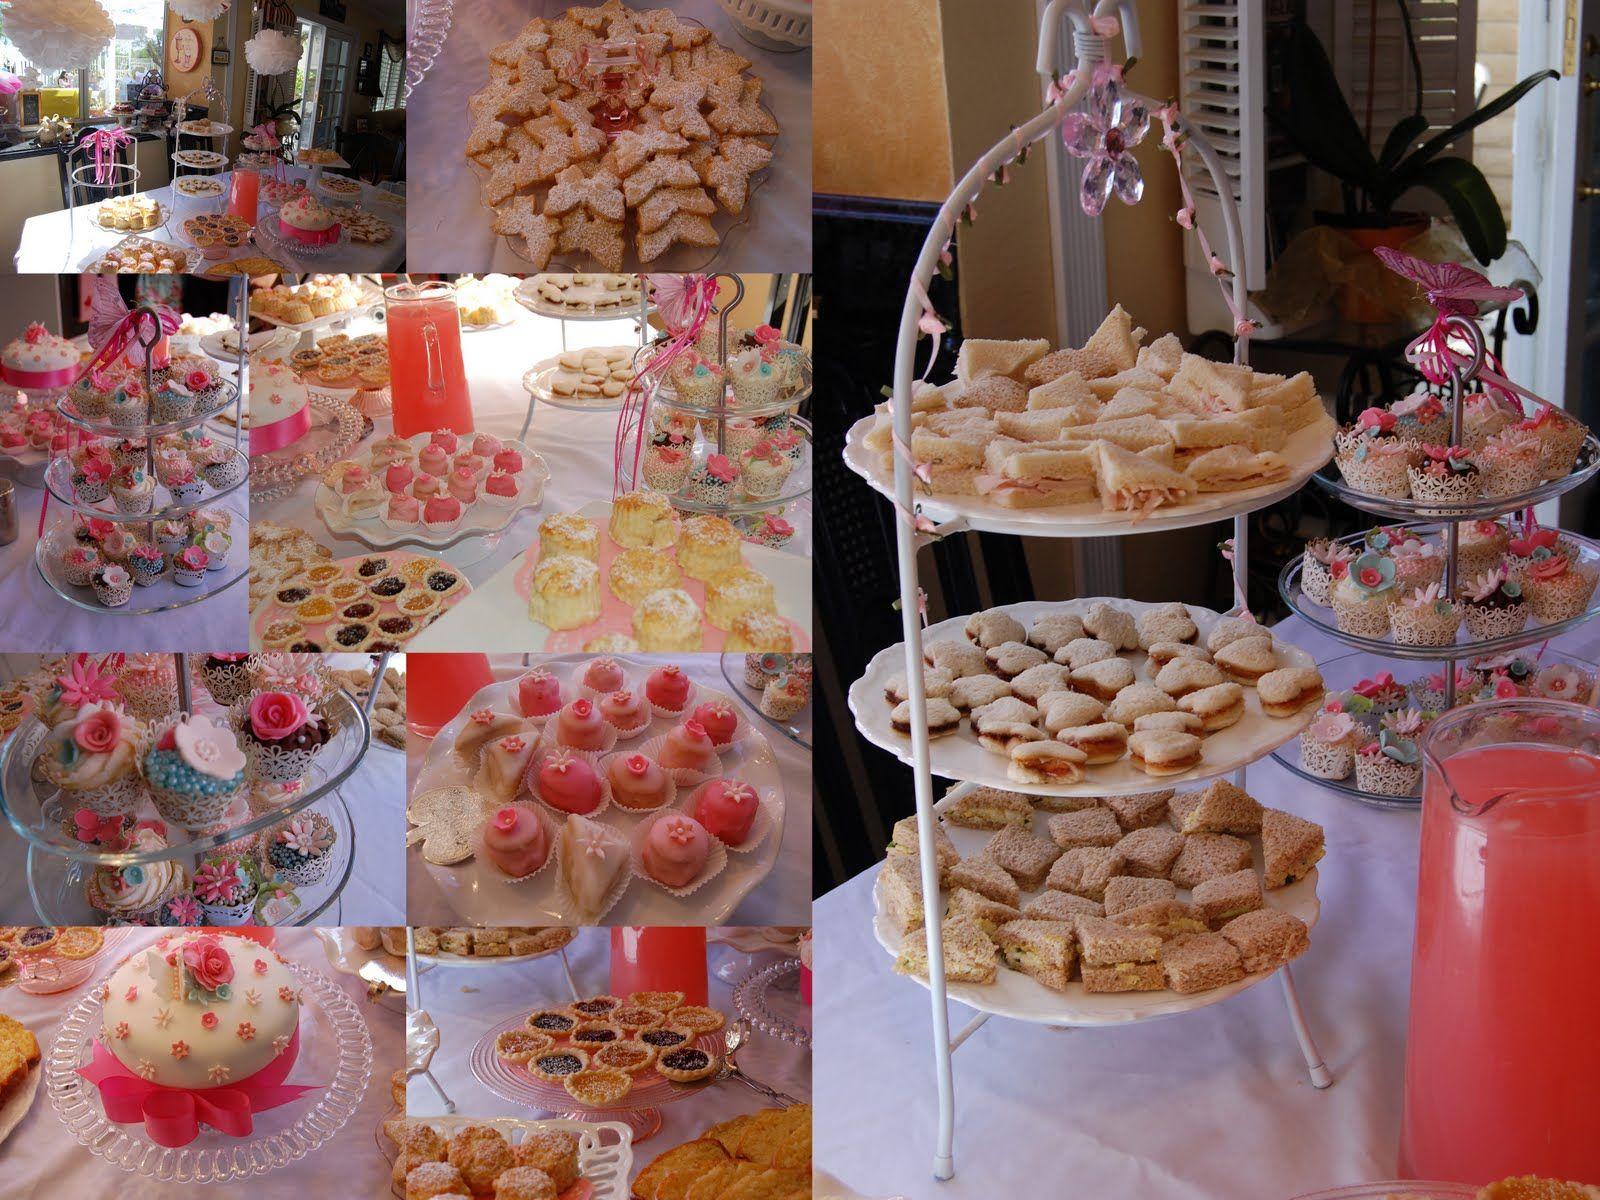 finger food ideas for bridal shower%0A Girls tea party food ideas       Neat food ideas   Pinterest   Girls tea  party  Tea parties and Food ideas